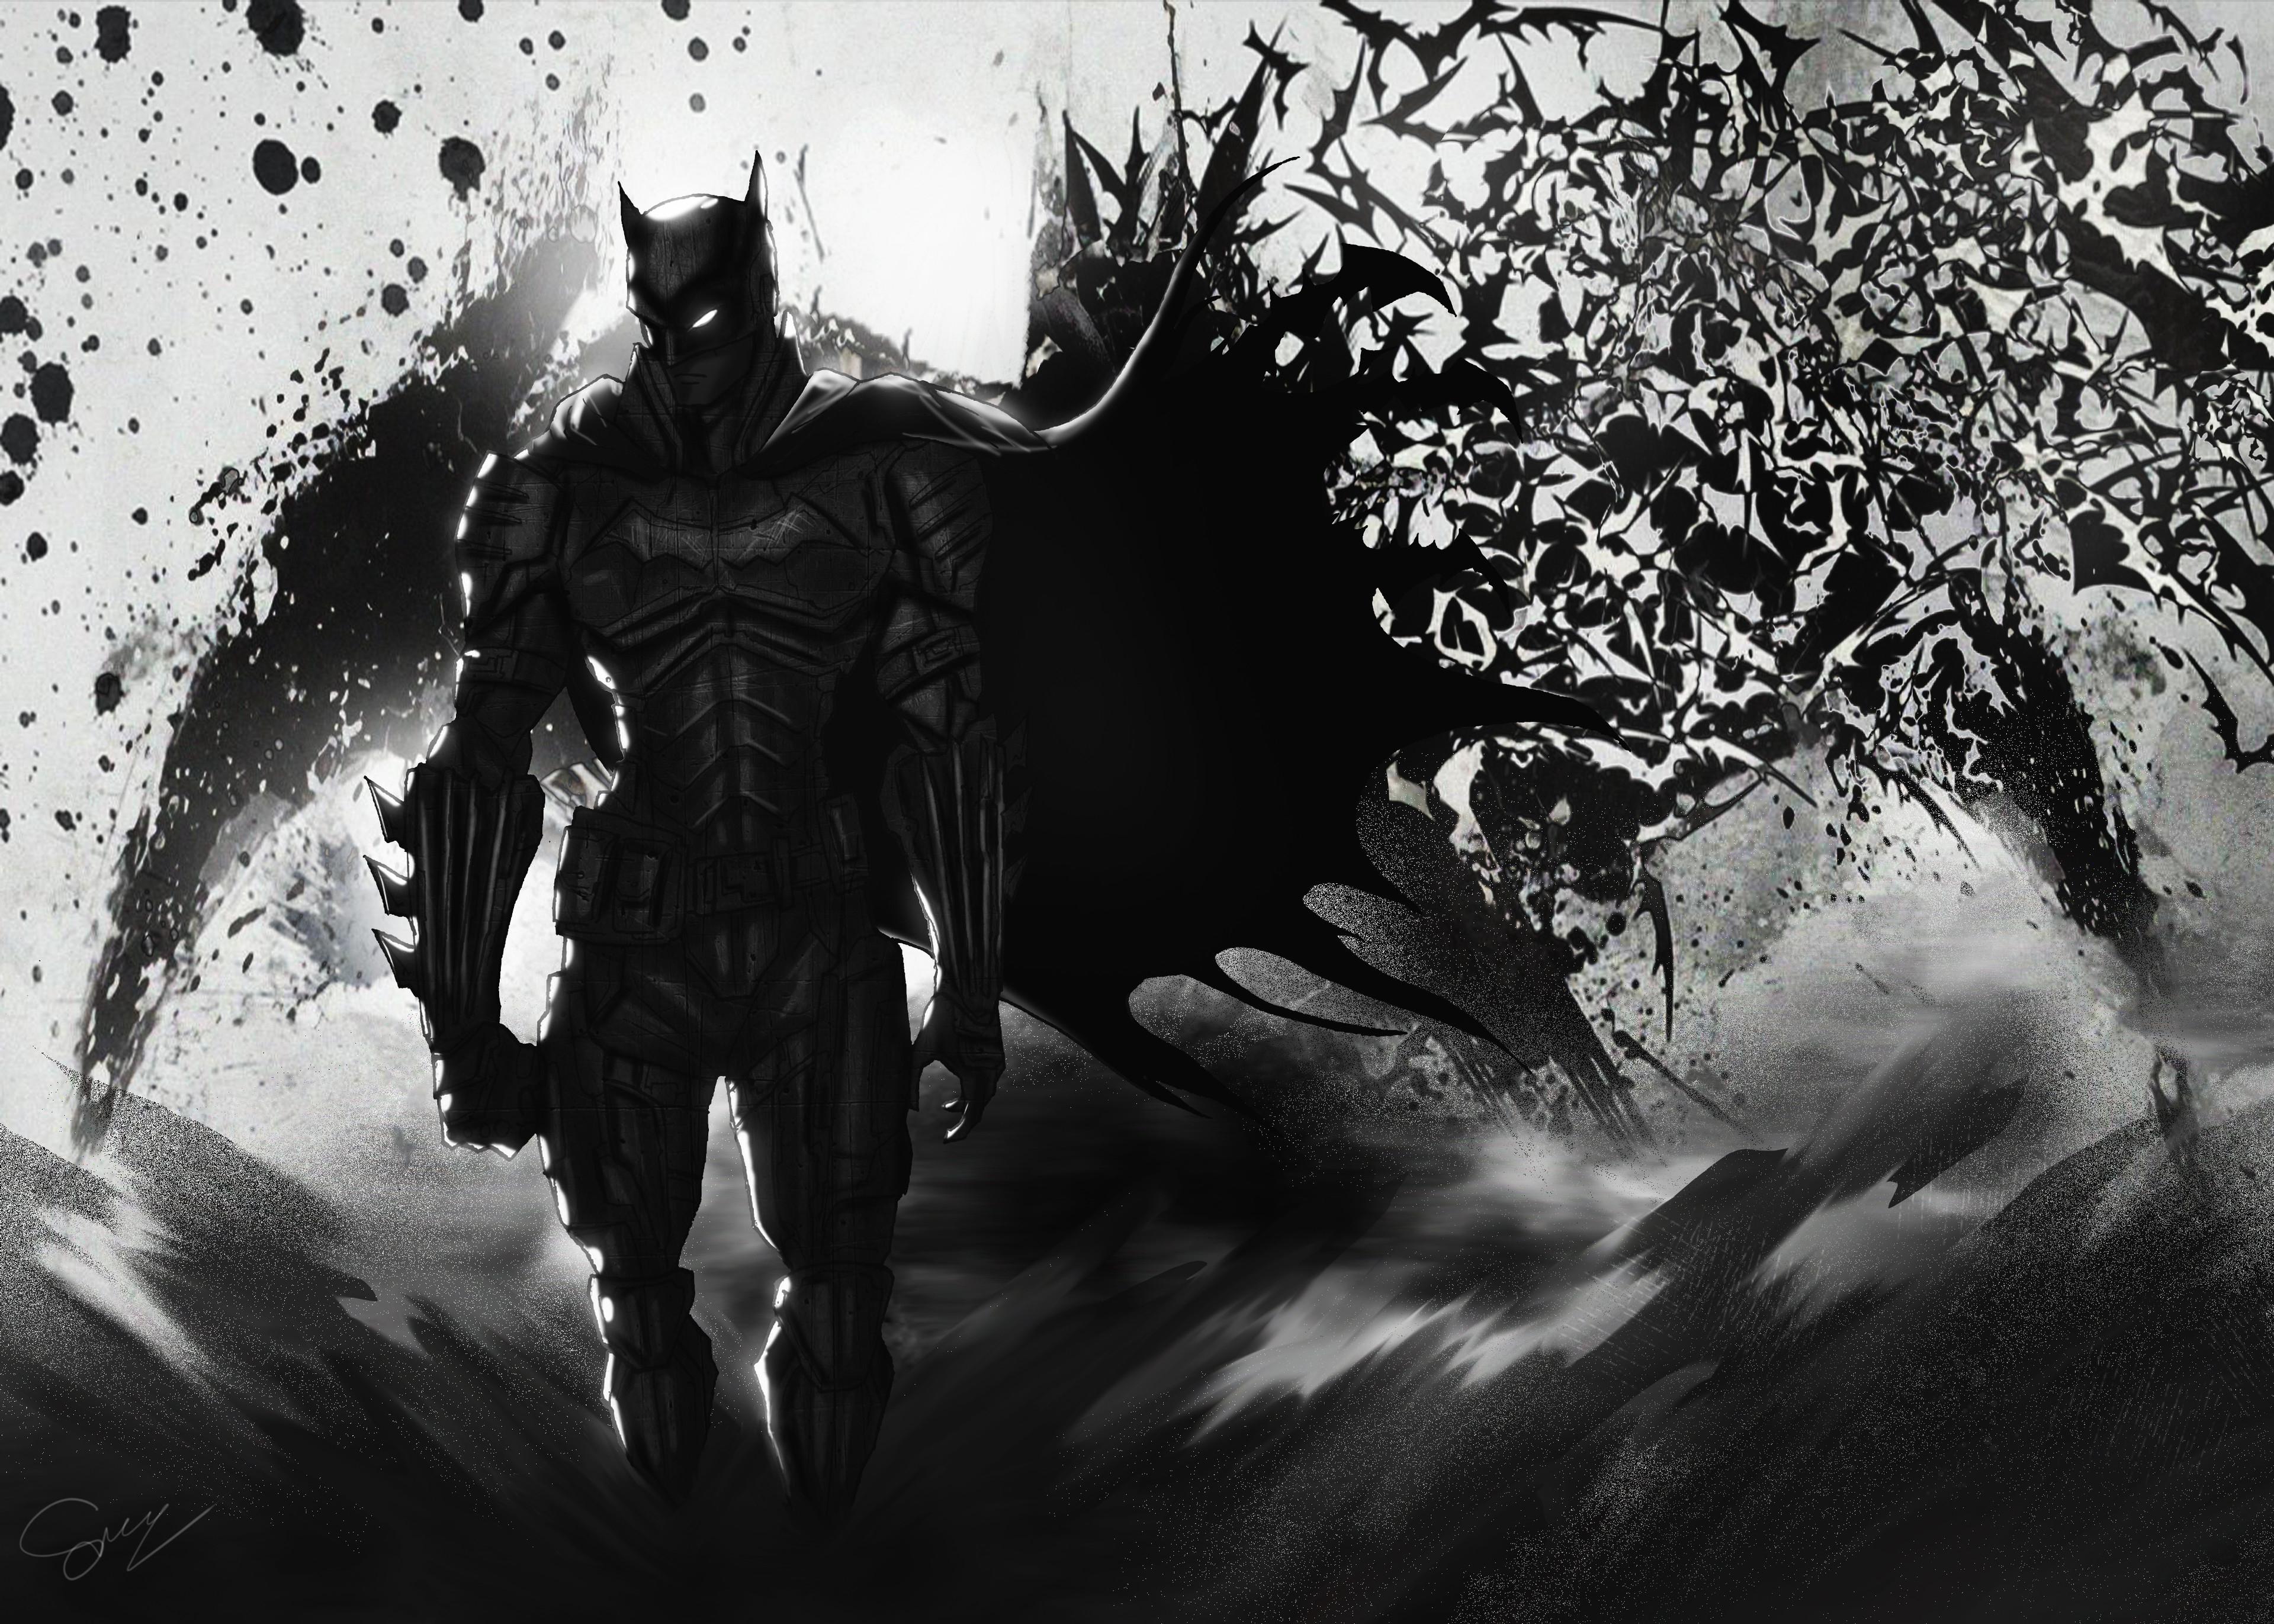 ArtStation - Batman, ★ STATO ☆ in 2021 | Batman, Dark